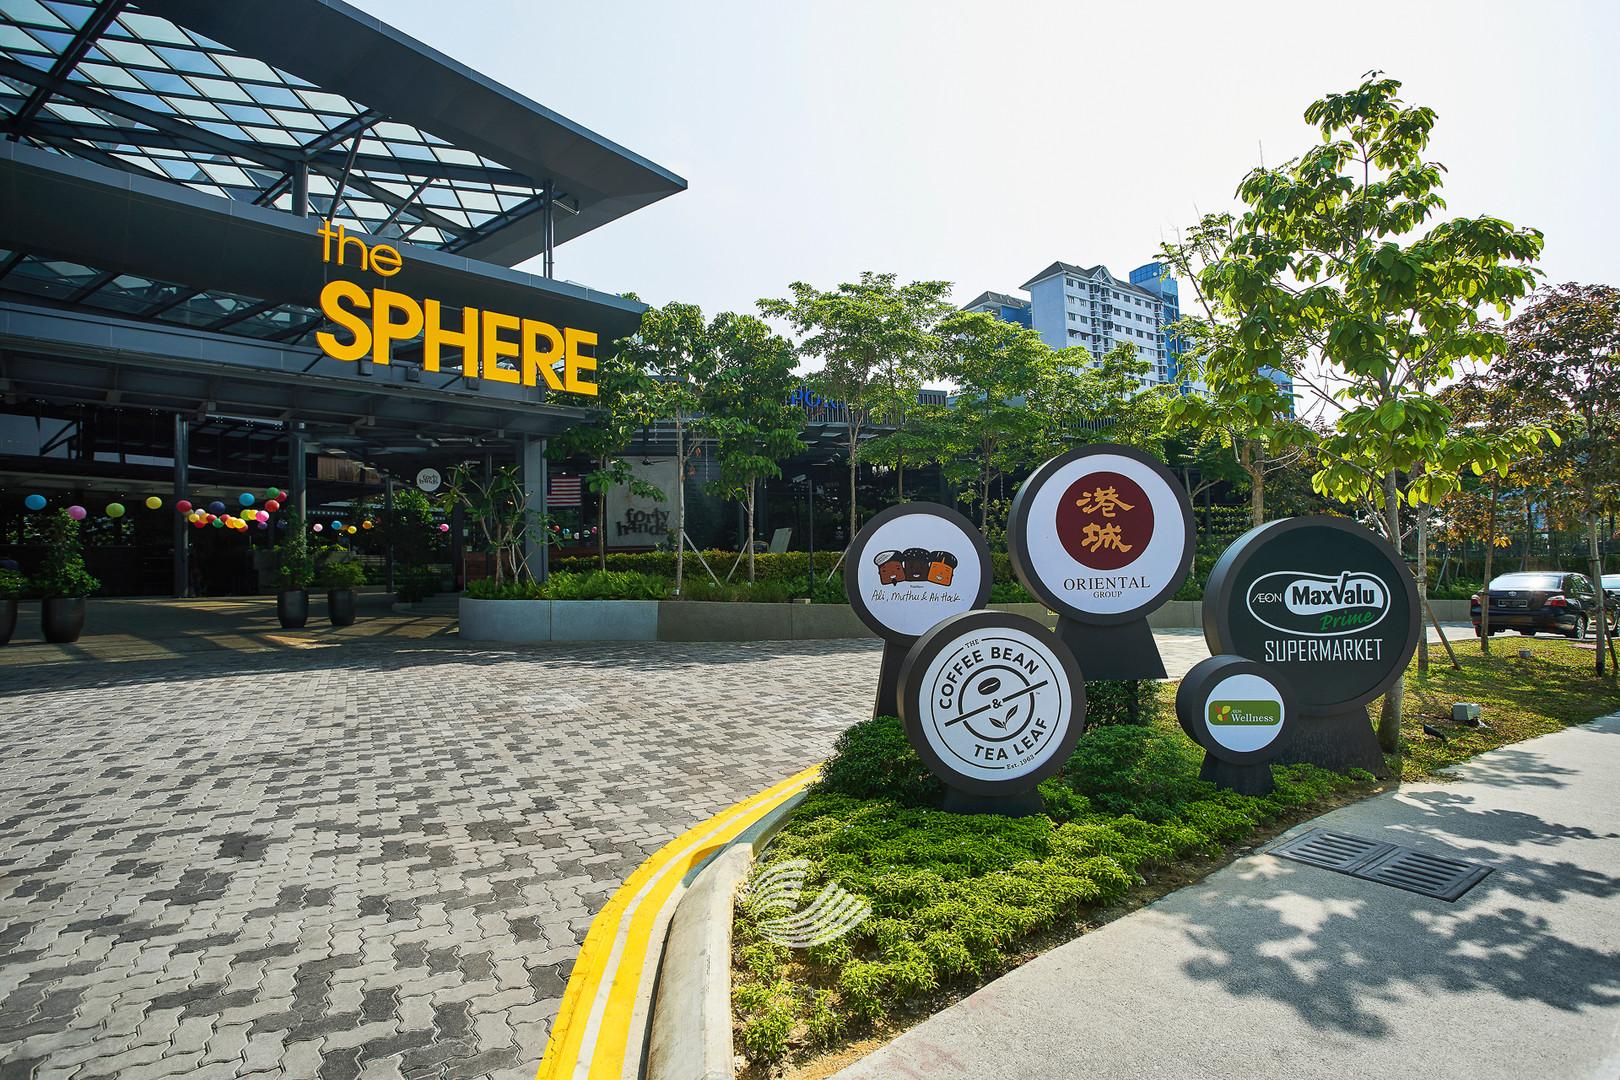 The Sphere-DSC02678a FA.jpg